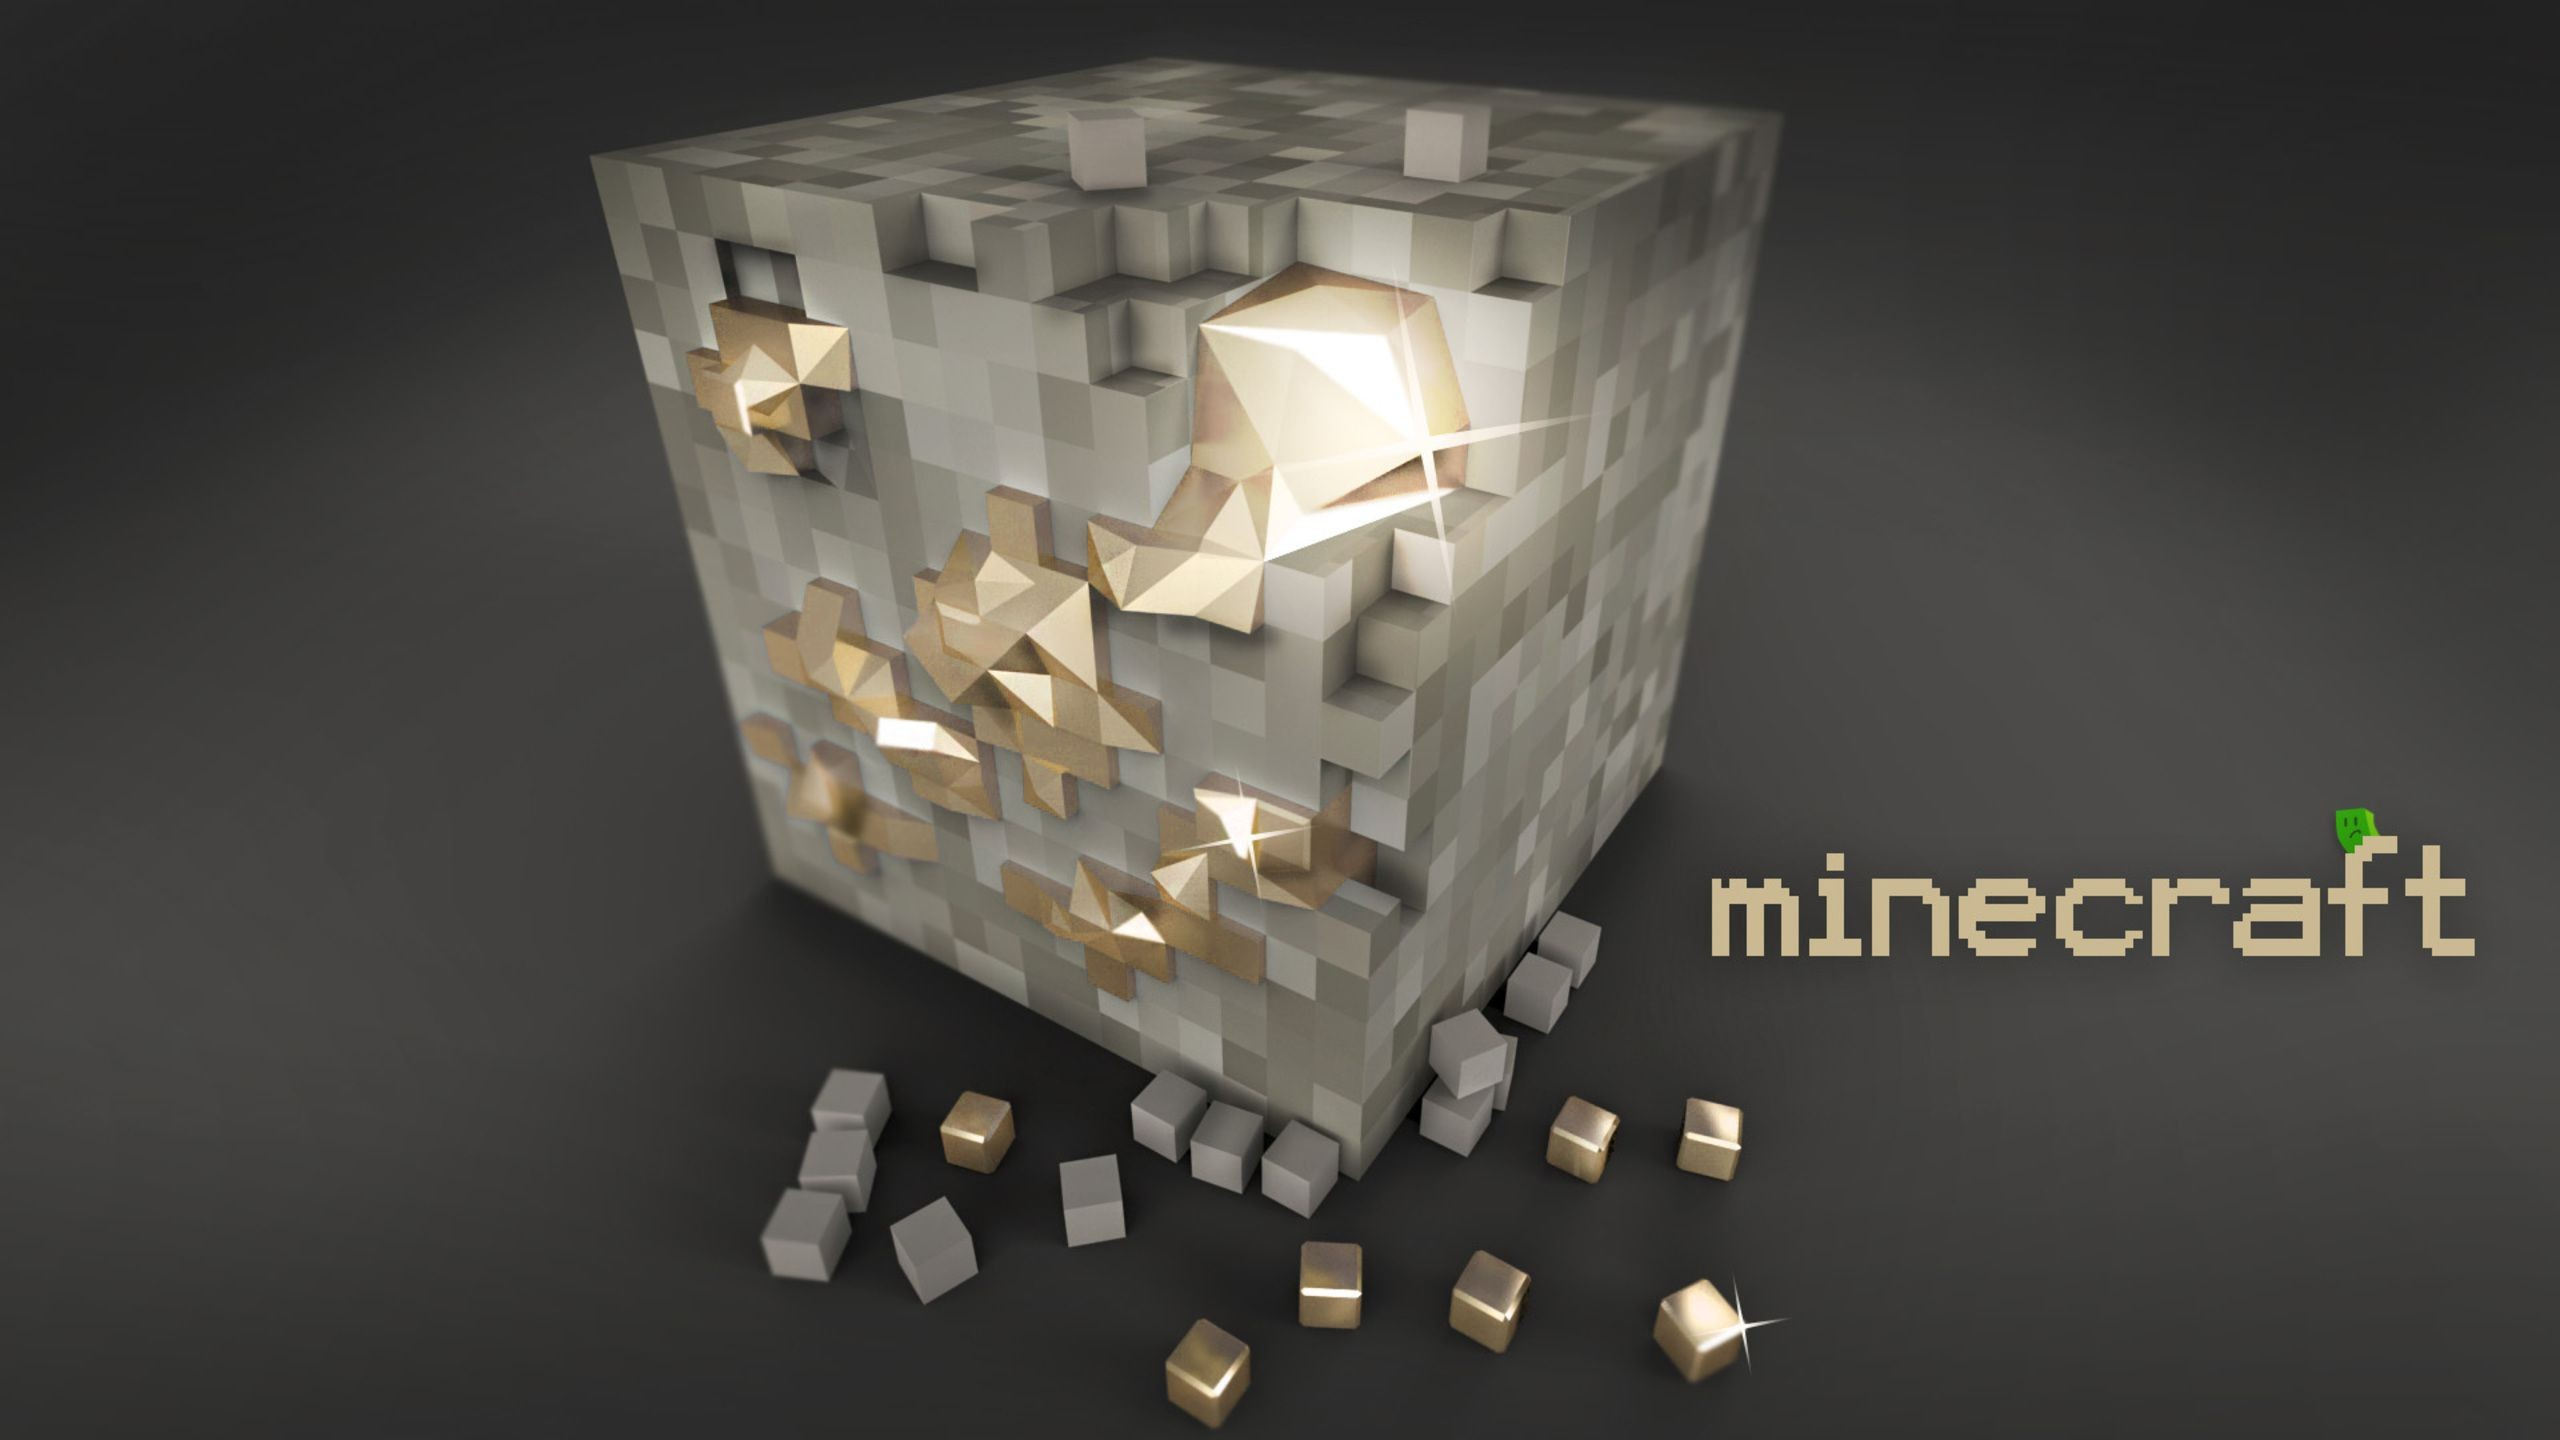 Minecraft 2560x1440 Pixels Abstract minecraft wallpaper 2560x1440